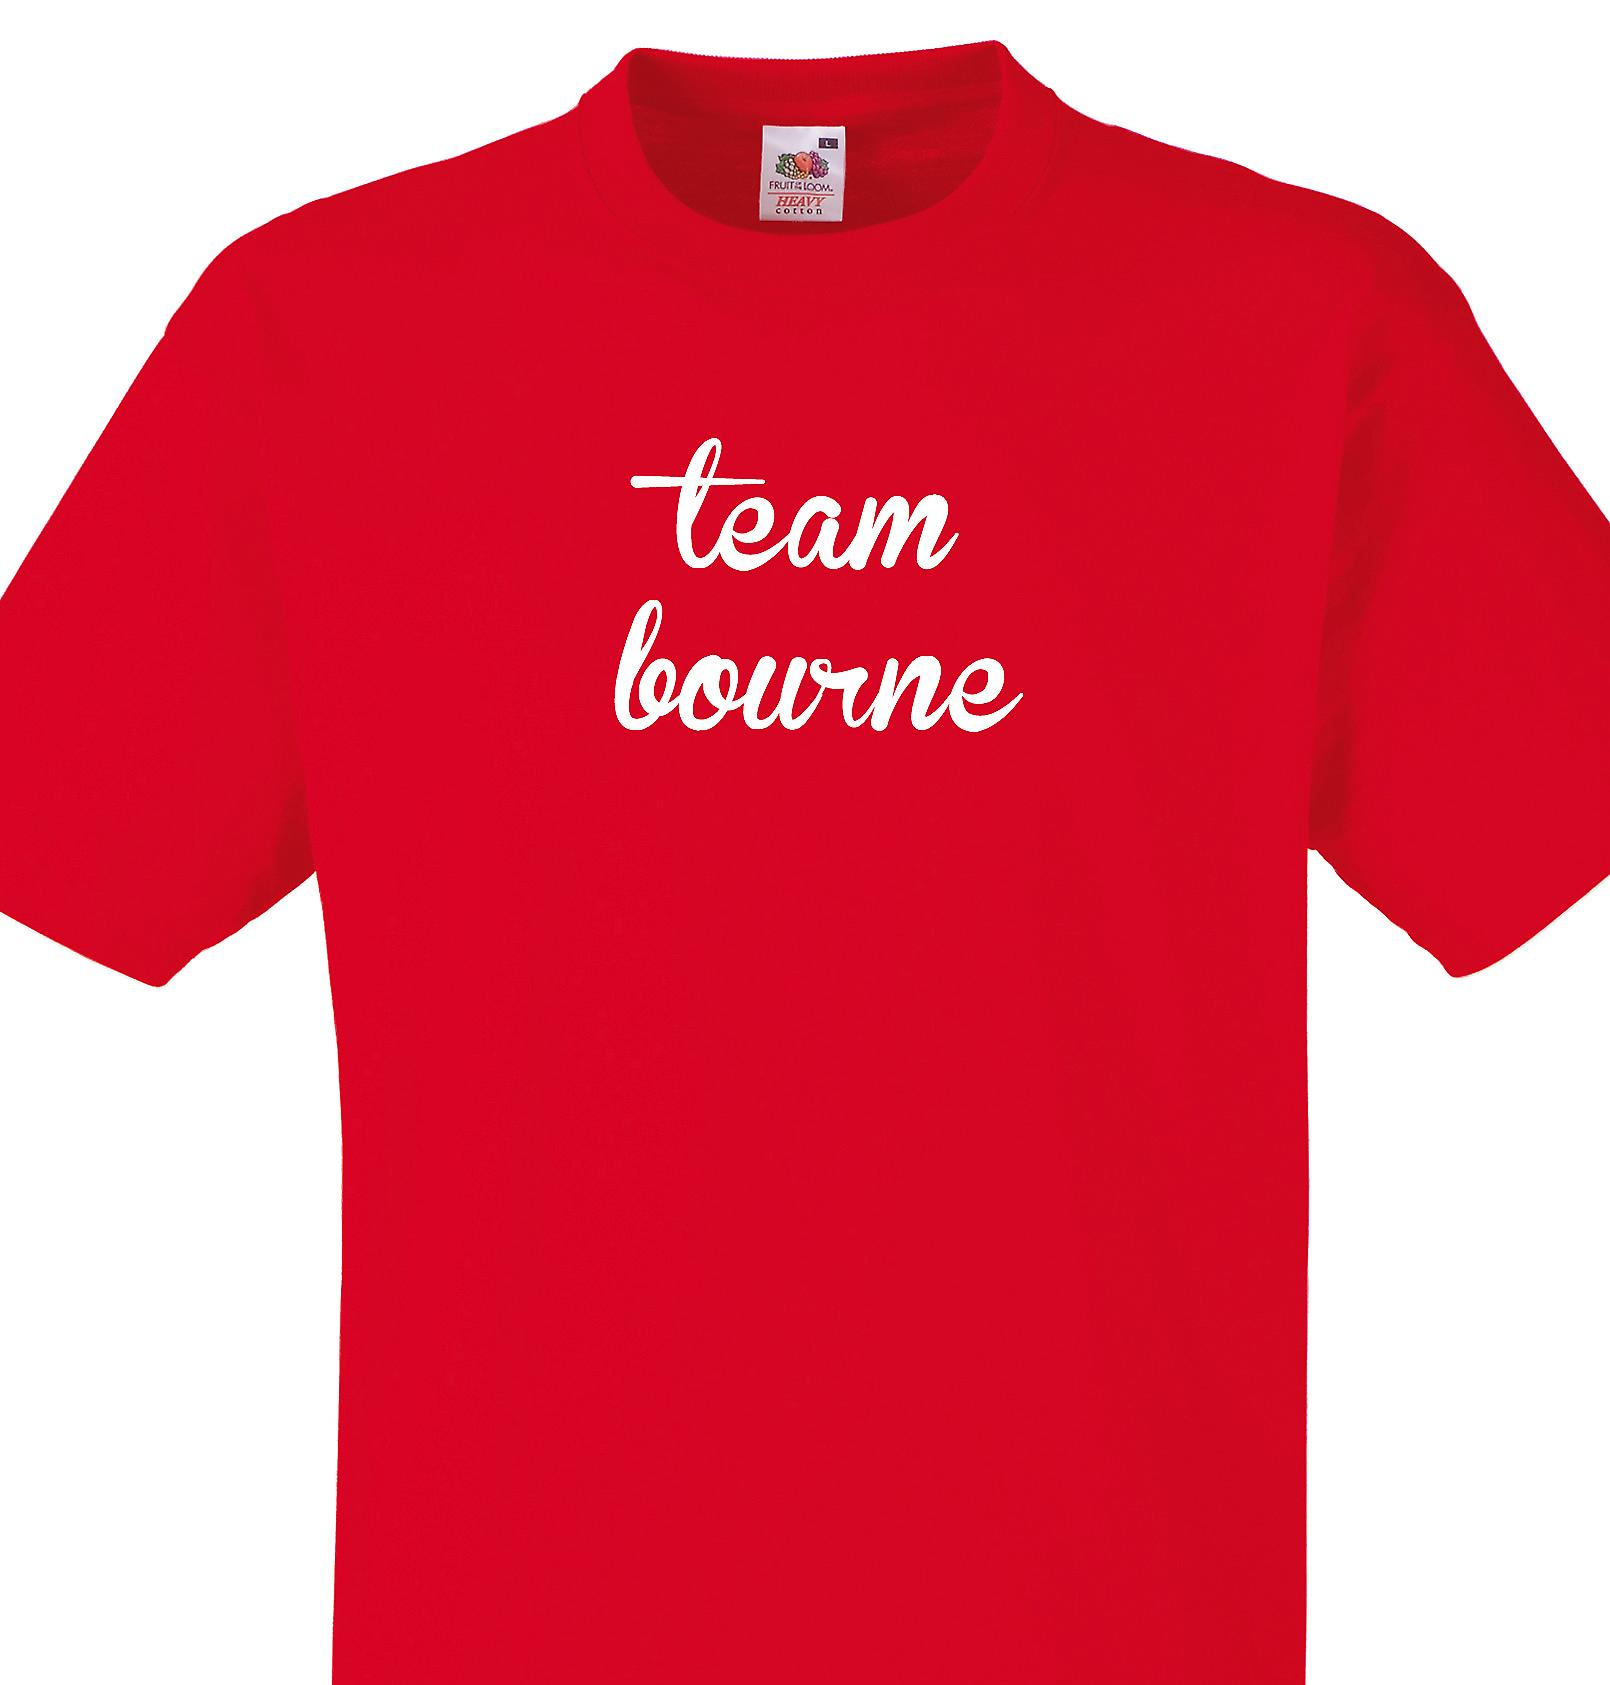 Team Bourne Red T shirt